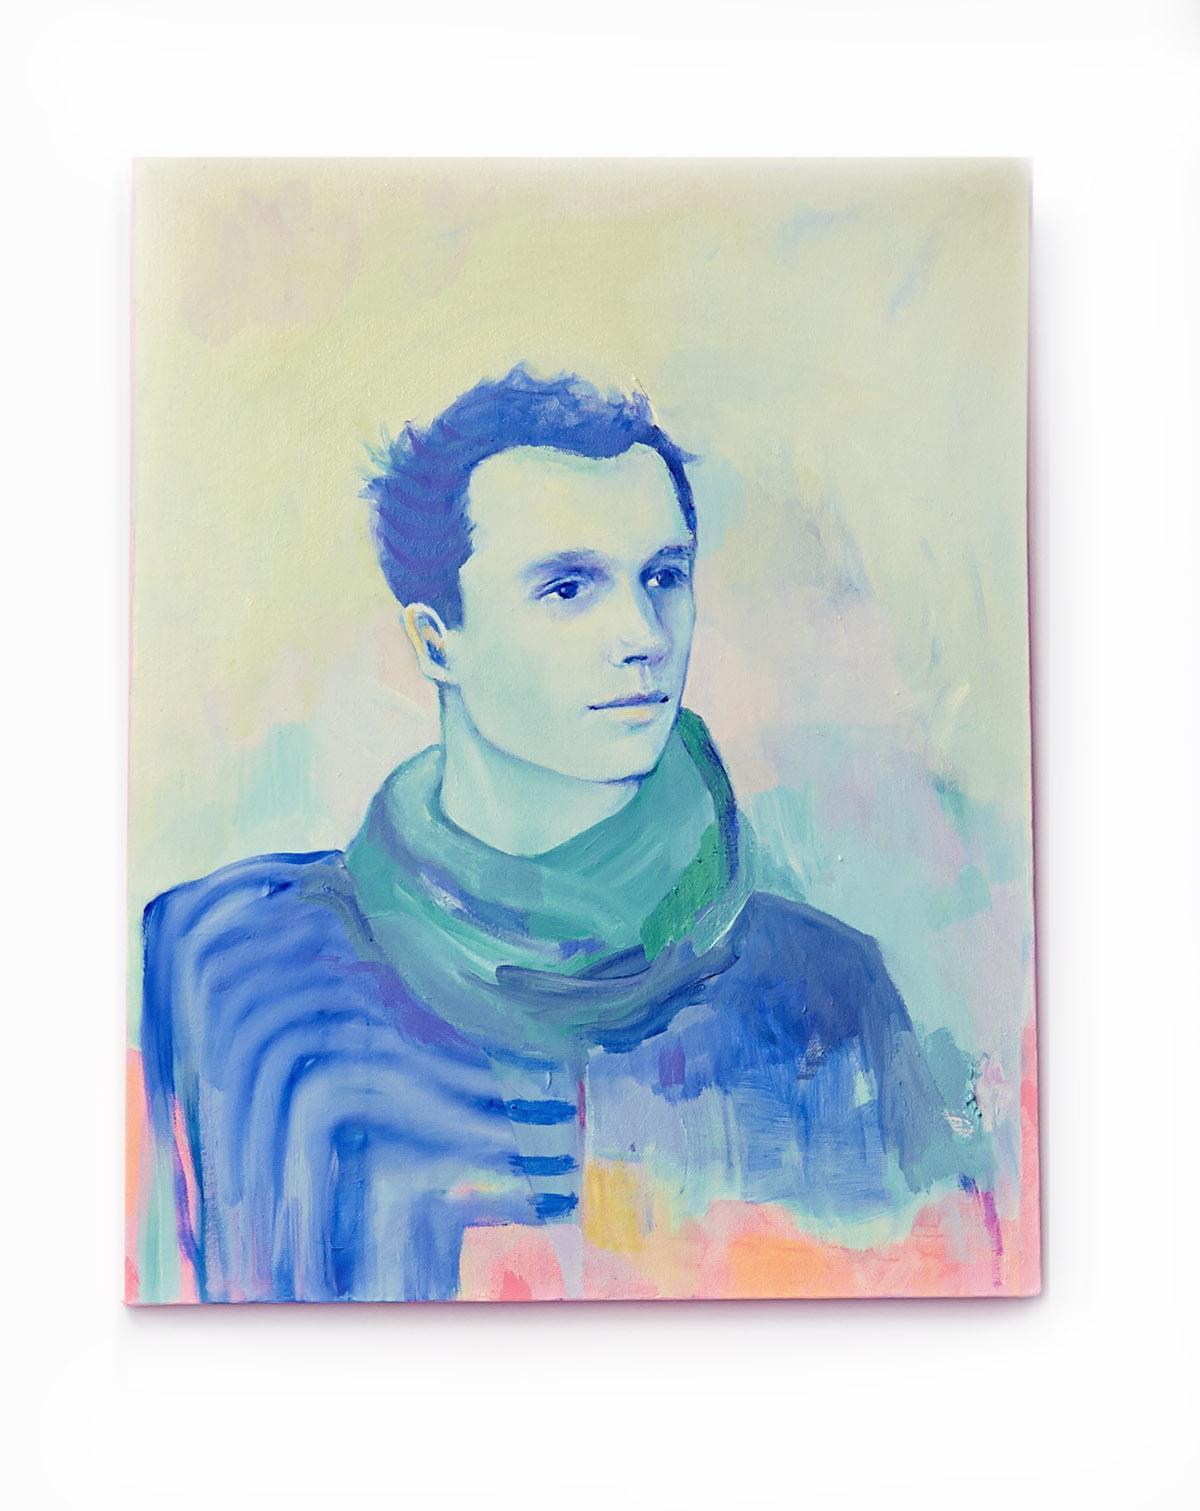 pawel voz, oil on canvas, 16 x 20 in. 2014